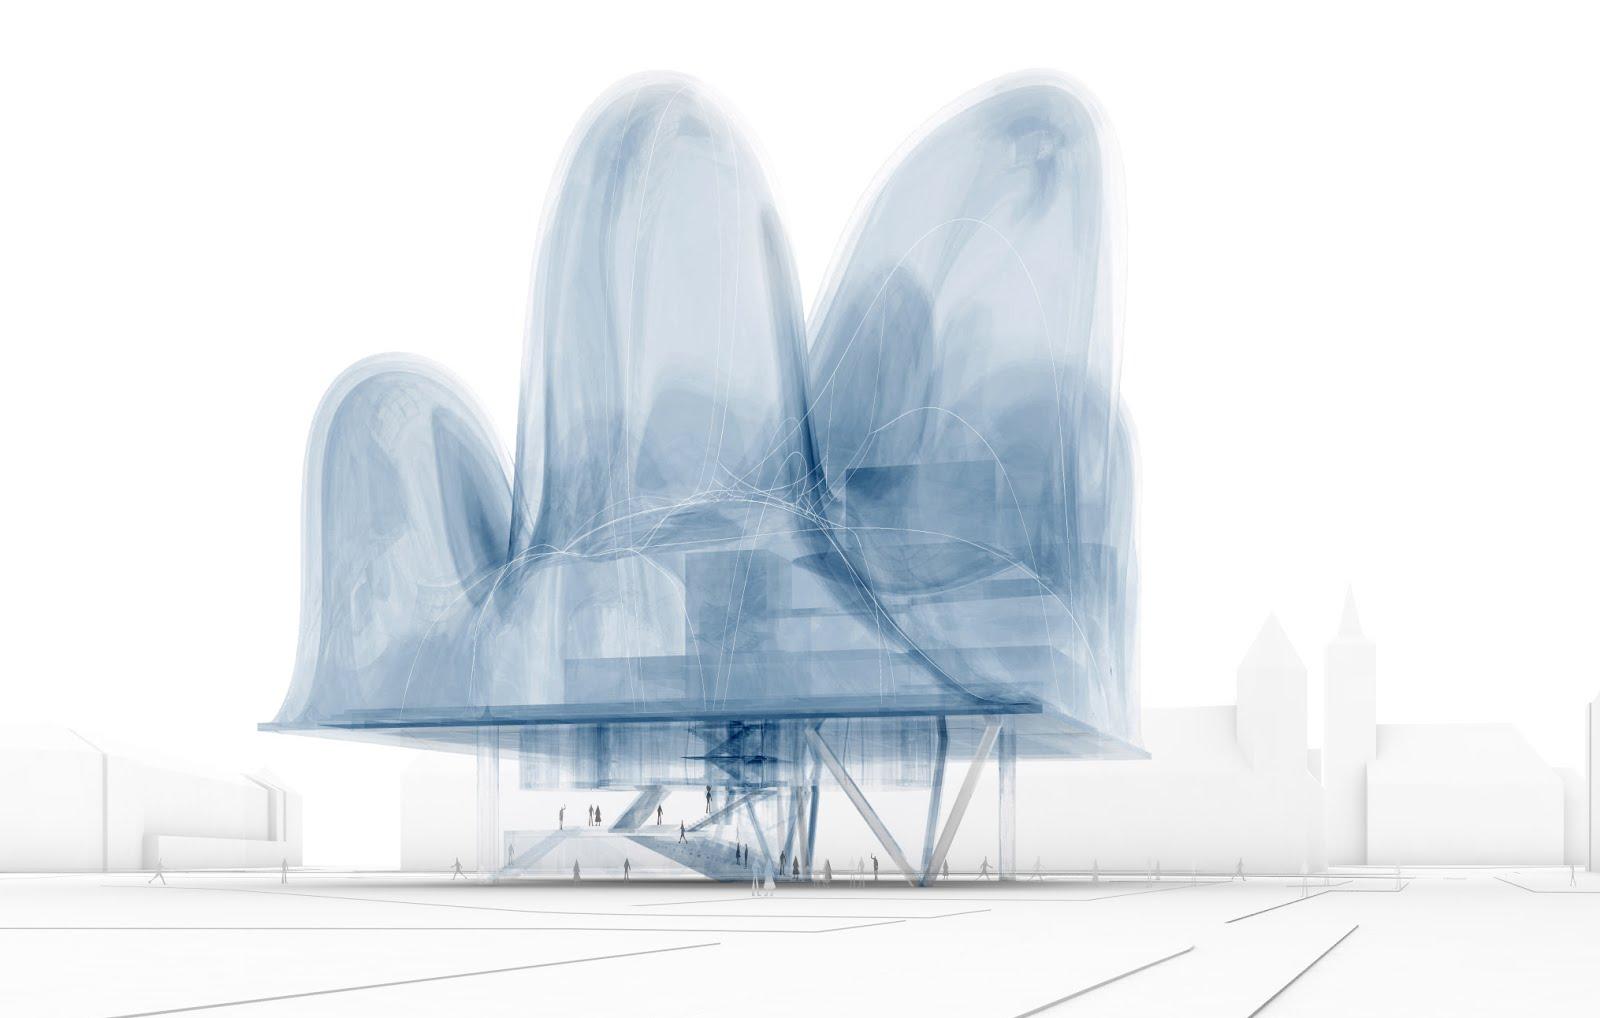 gonzalo va llo mart nez work experience. Black Bedroom Furniture Sets. Home Design Ideas